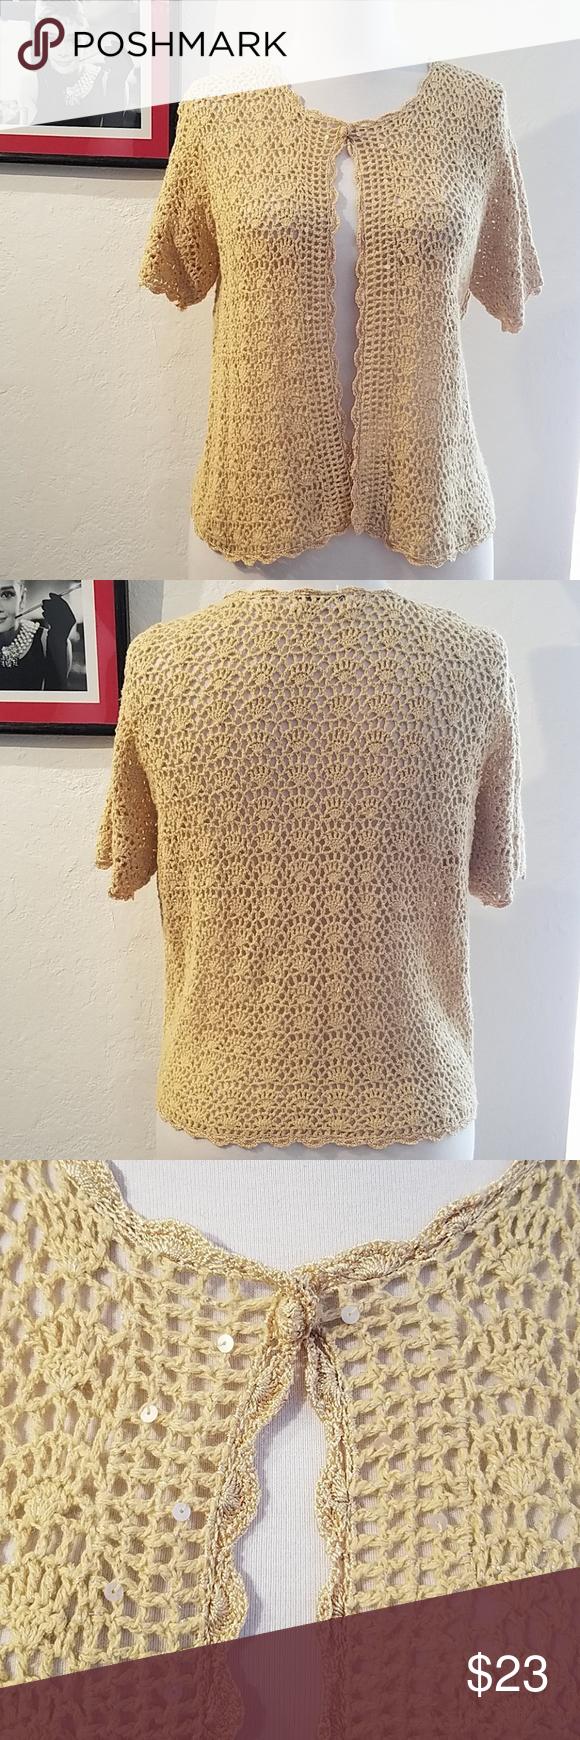 16dcd51ede Dress Barn Gold Crochet Short Sleeve Sweater Dress Barn Gold Crochet Short  Sleeve Sweater with sparkly